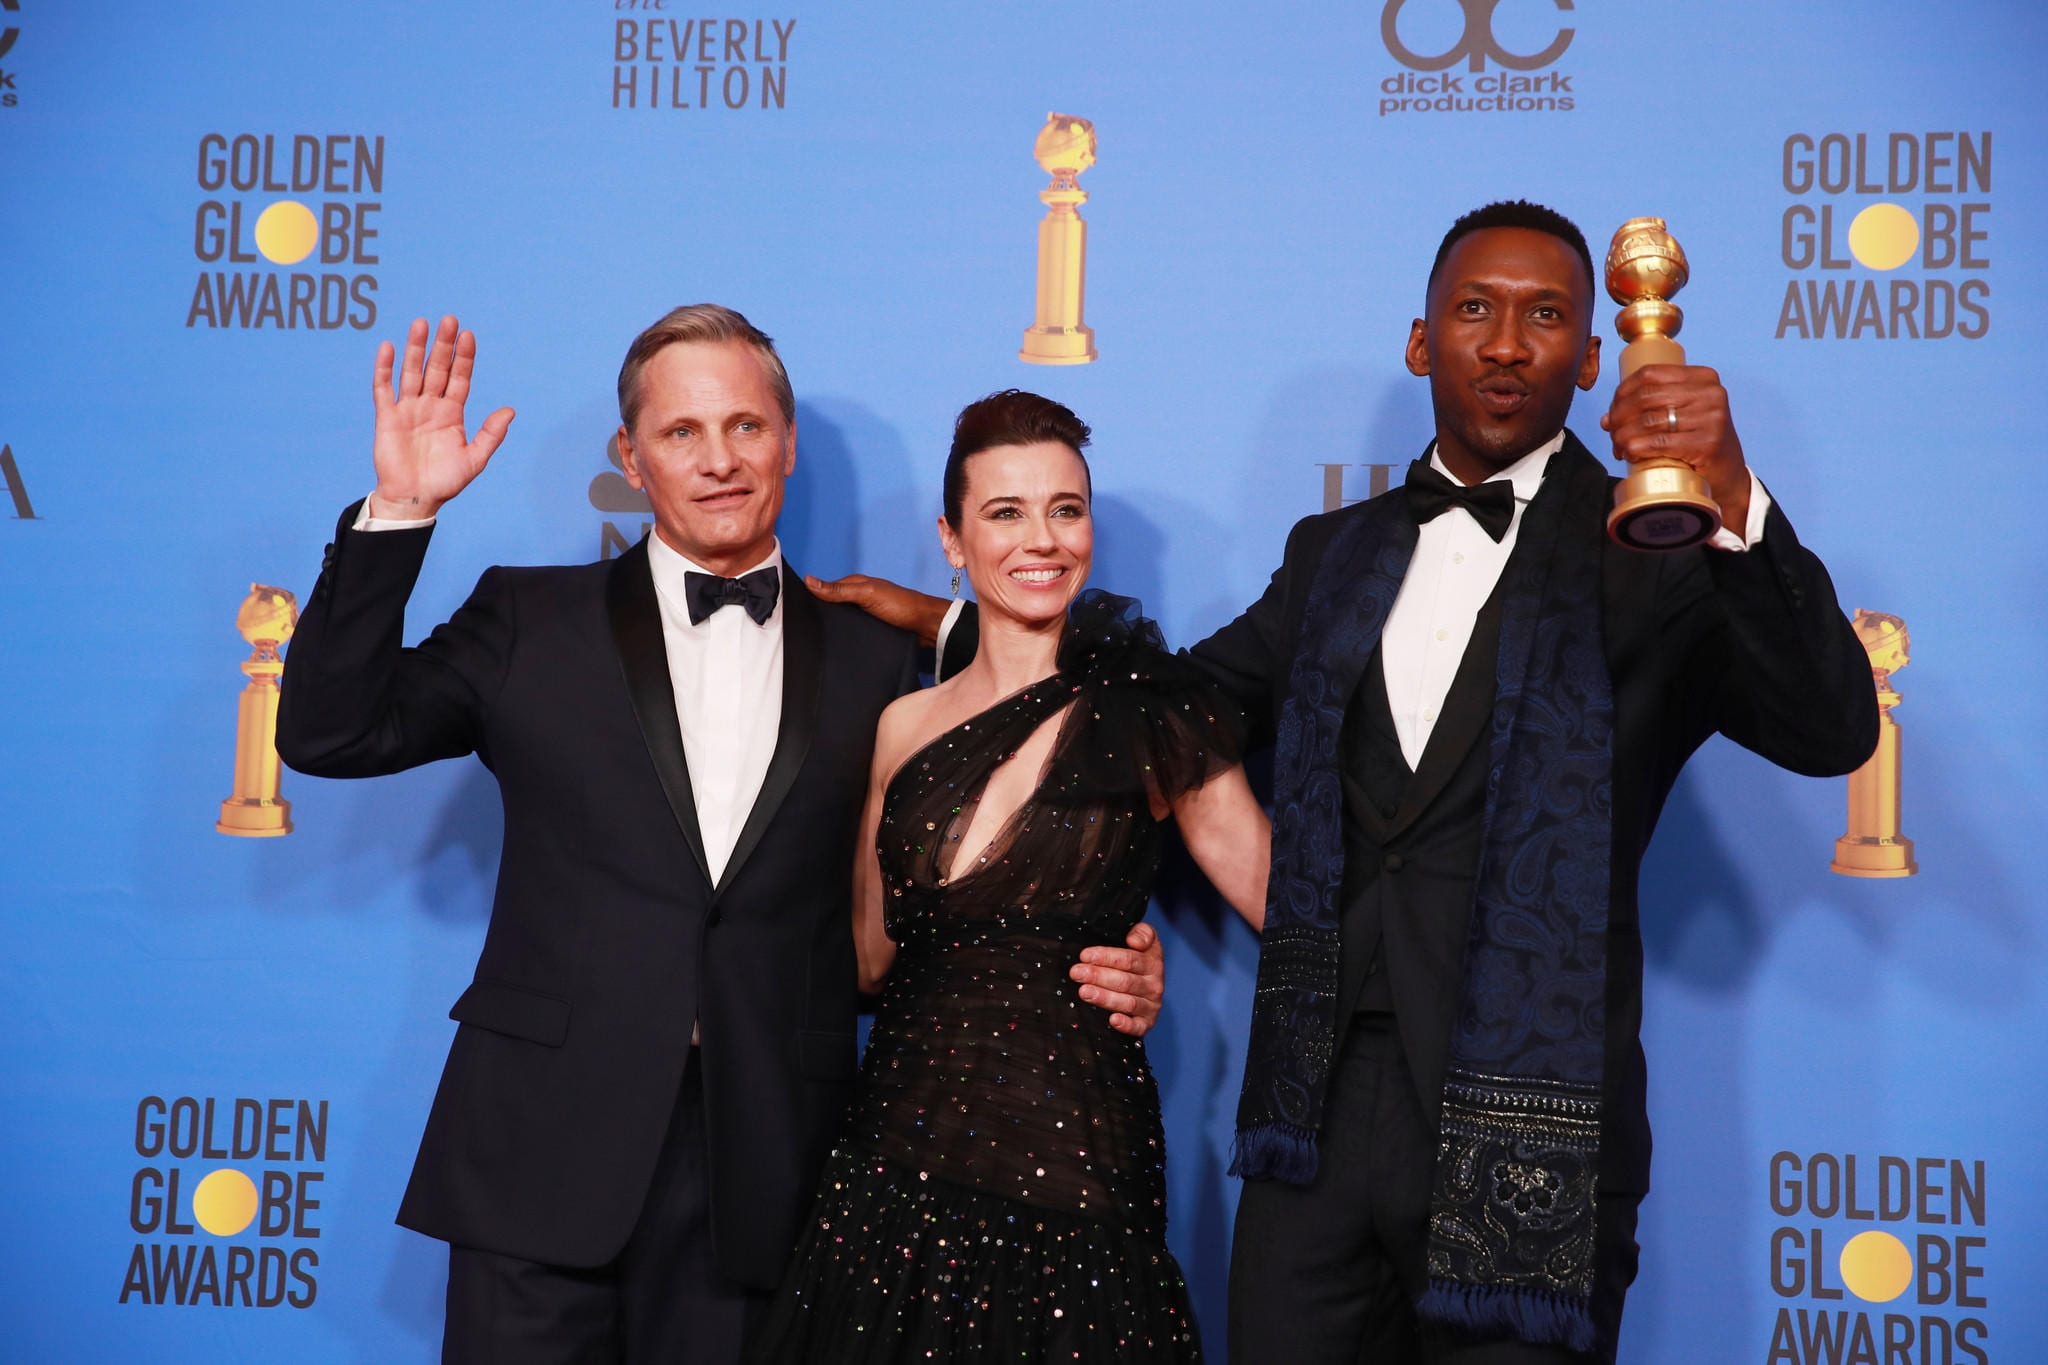 Golden Globe Awards 2019 award list